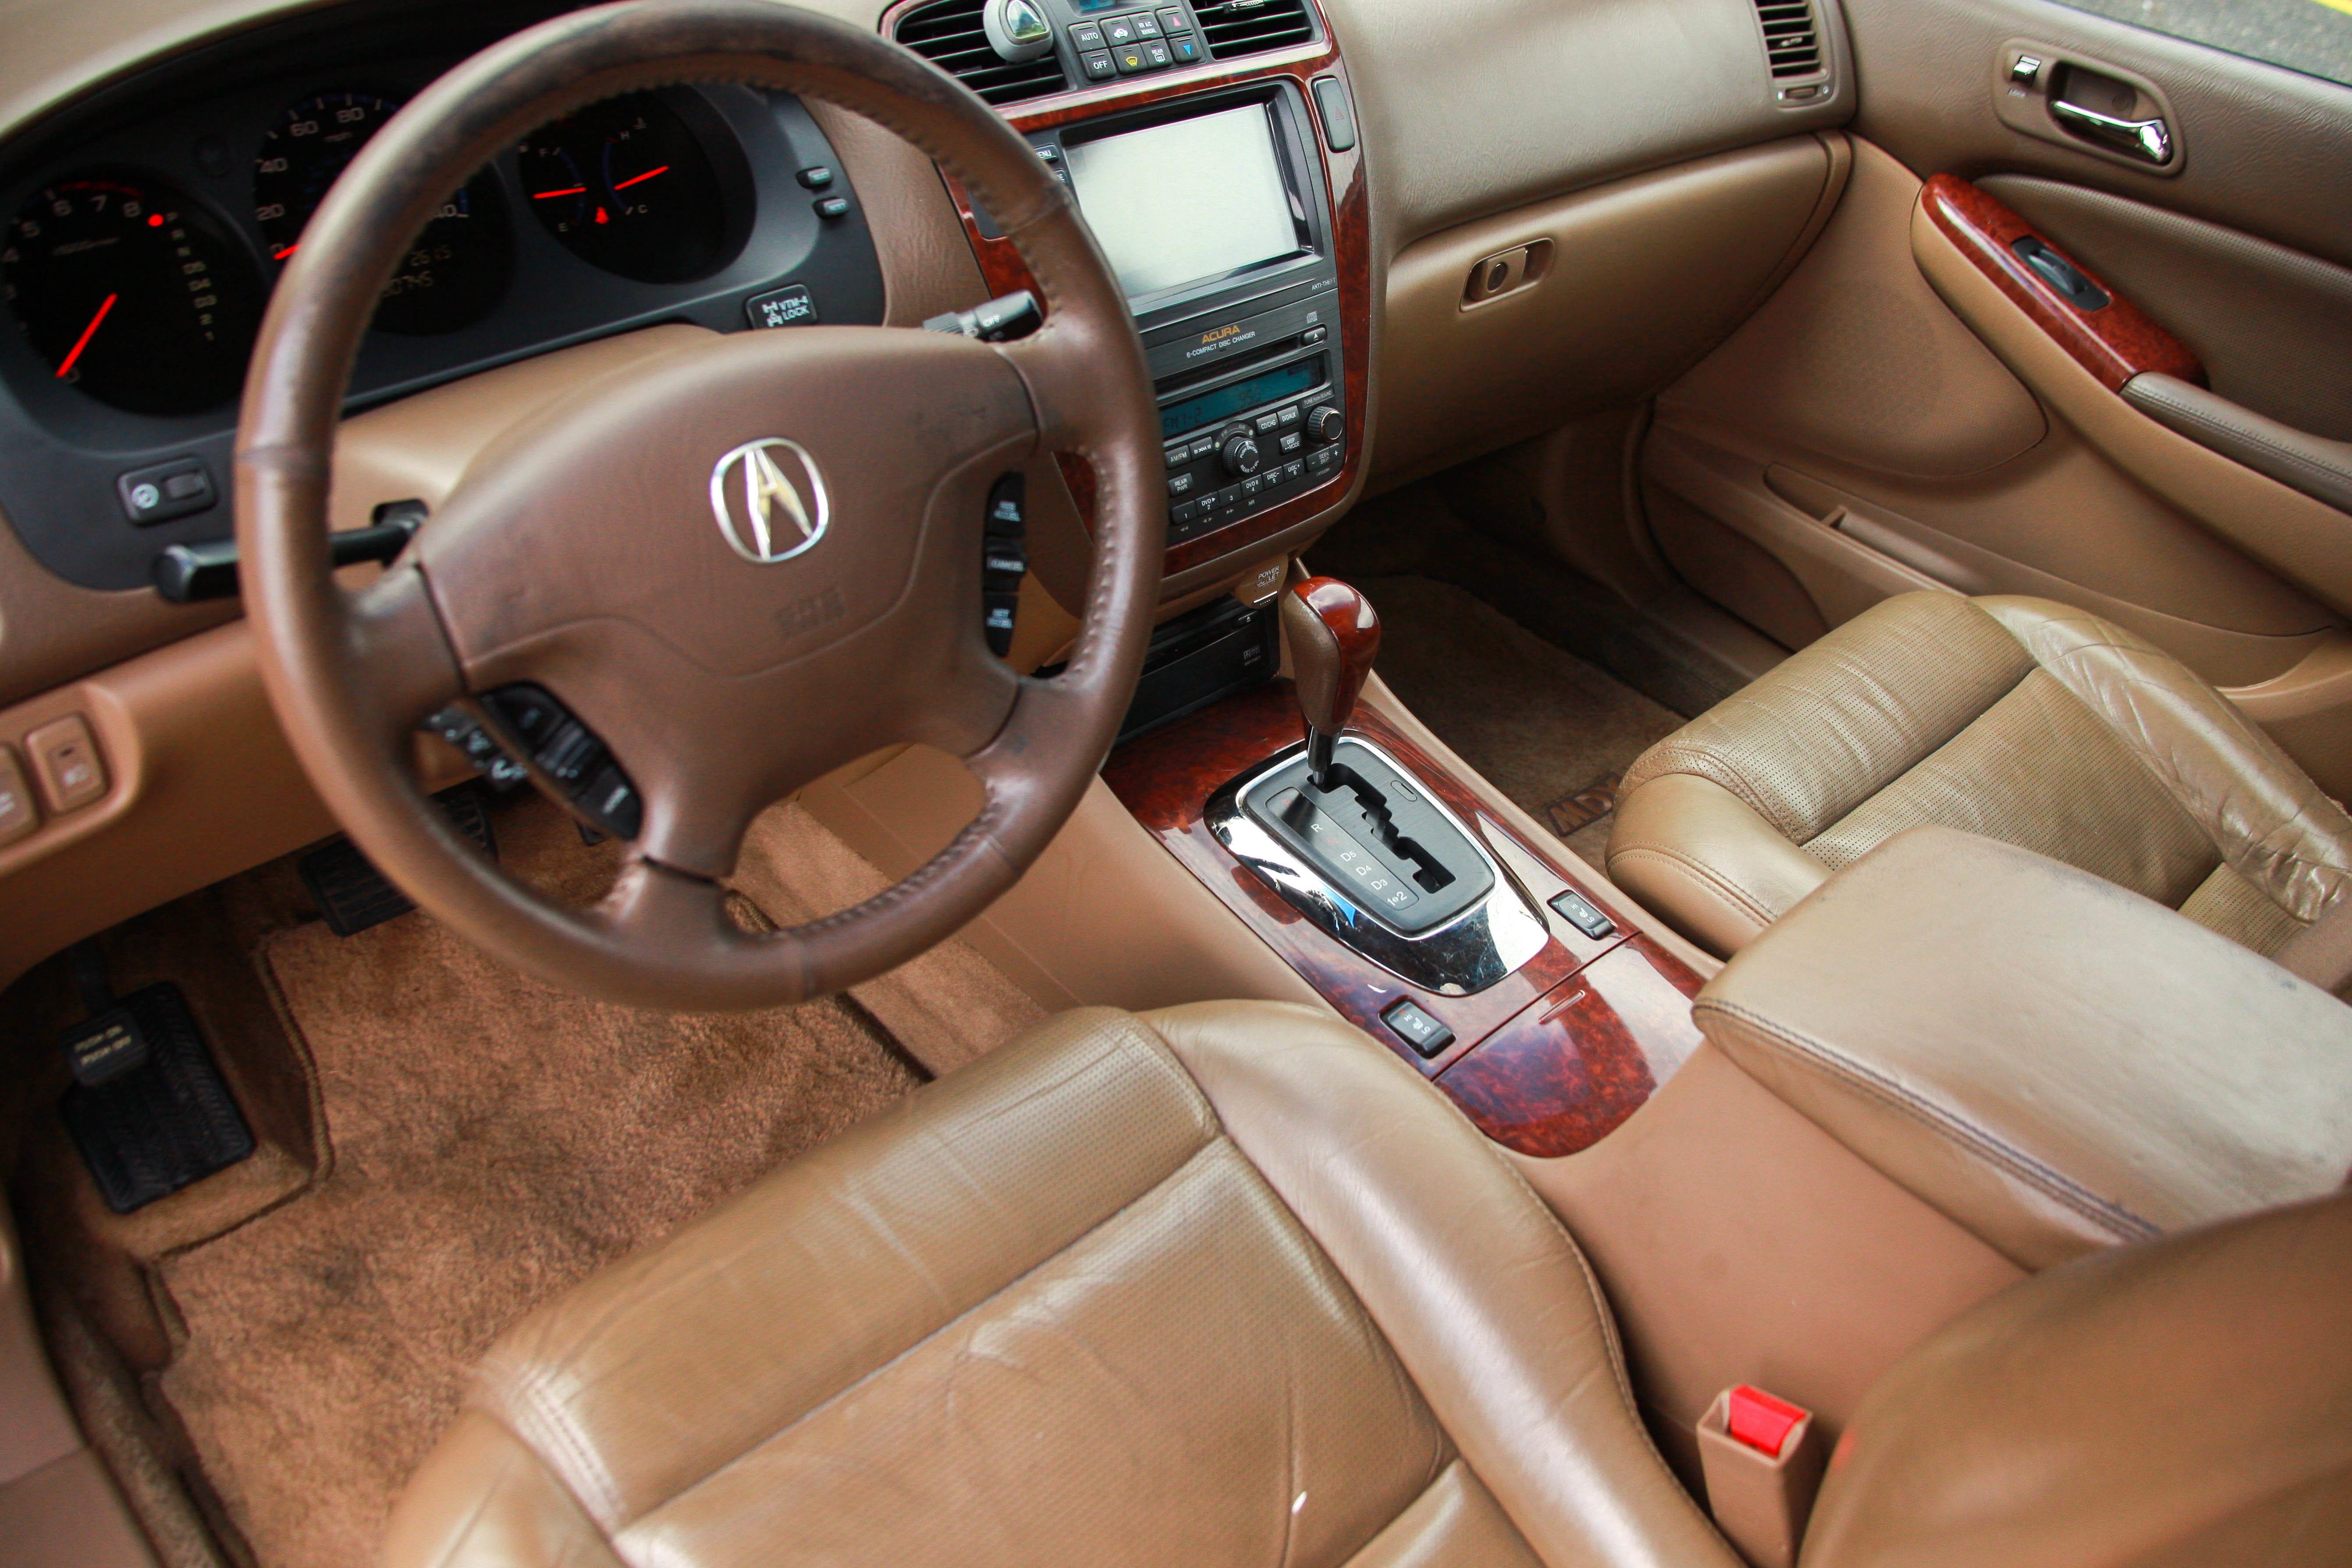 2005 Acura Mdx Touring Car Dealership In Philadelphia